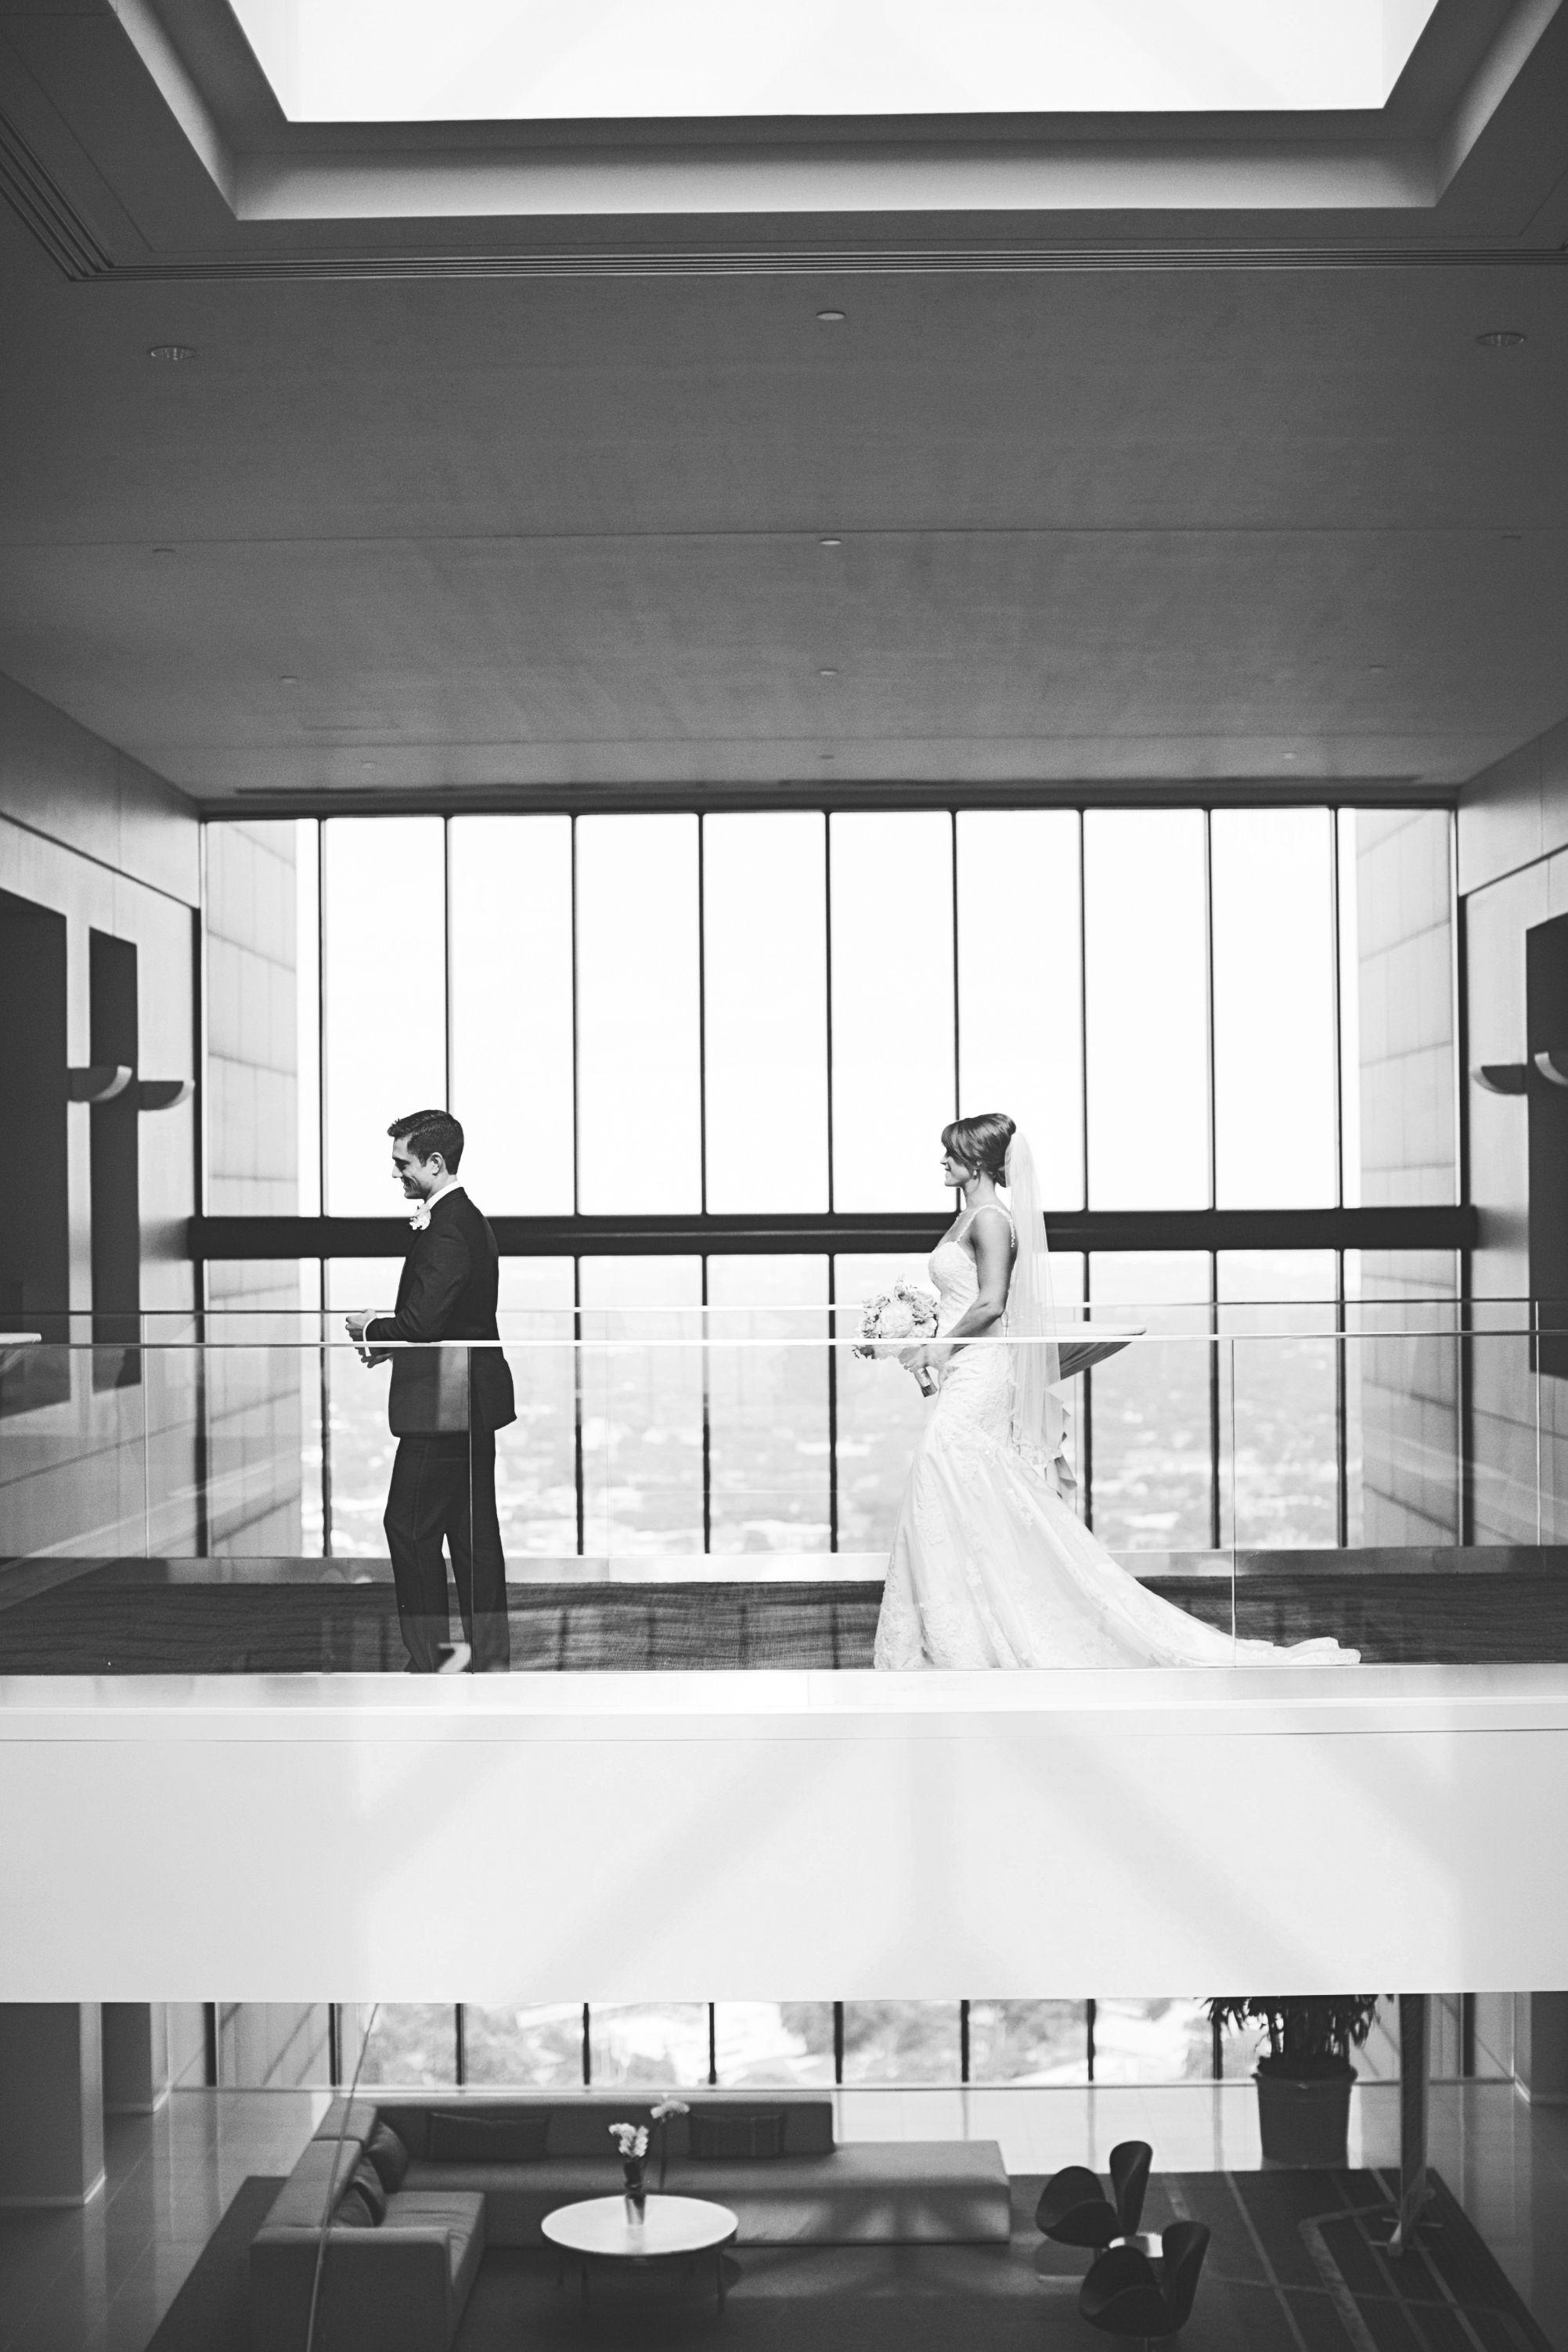 eephotome.alex.justin.wedding-128bw.jpg